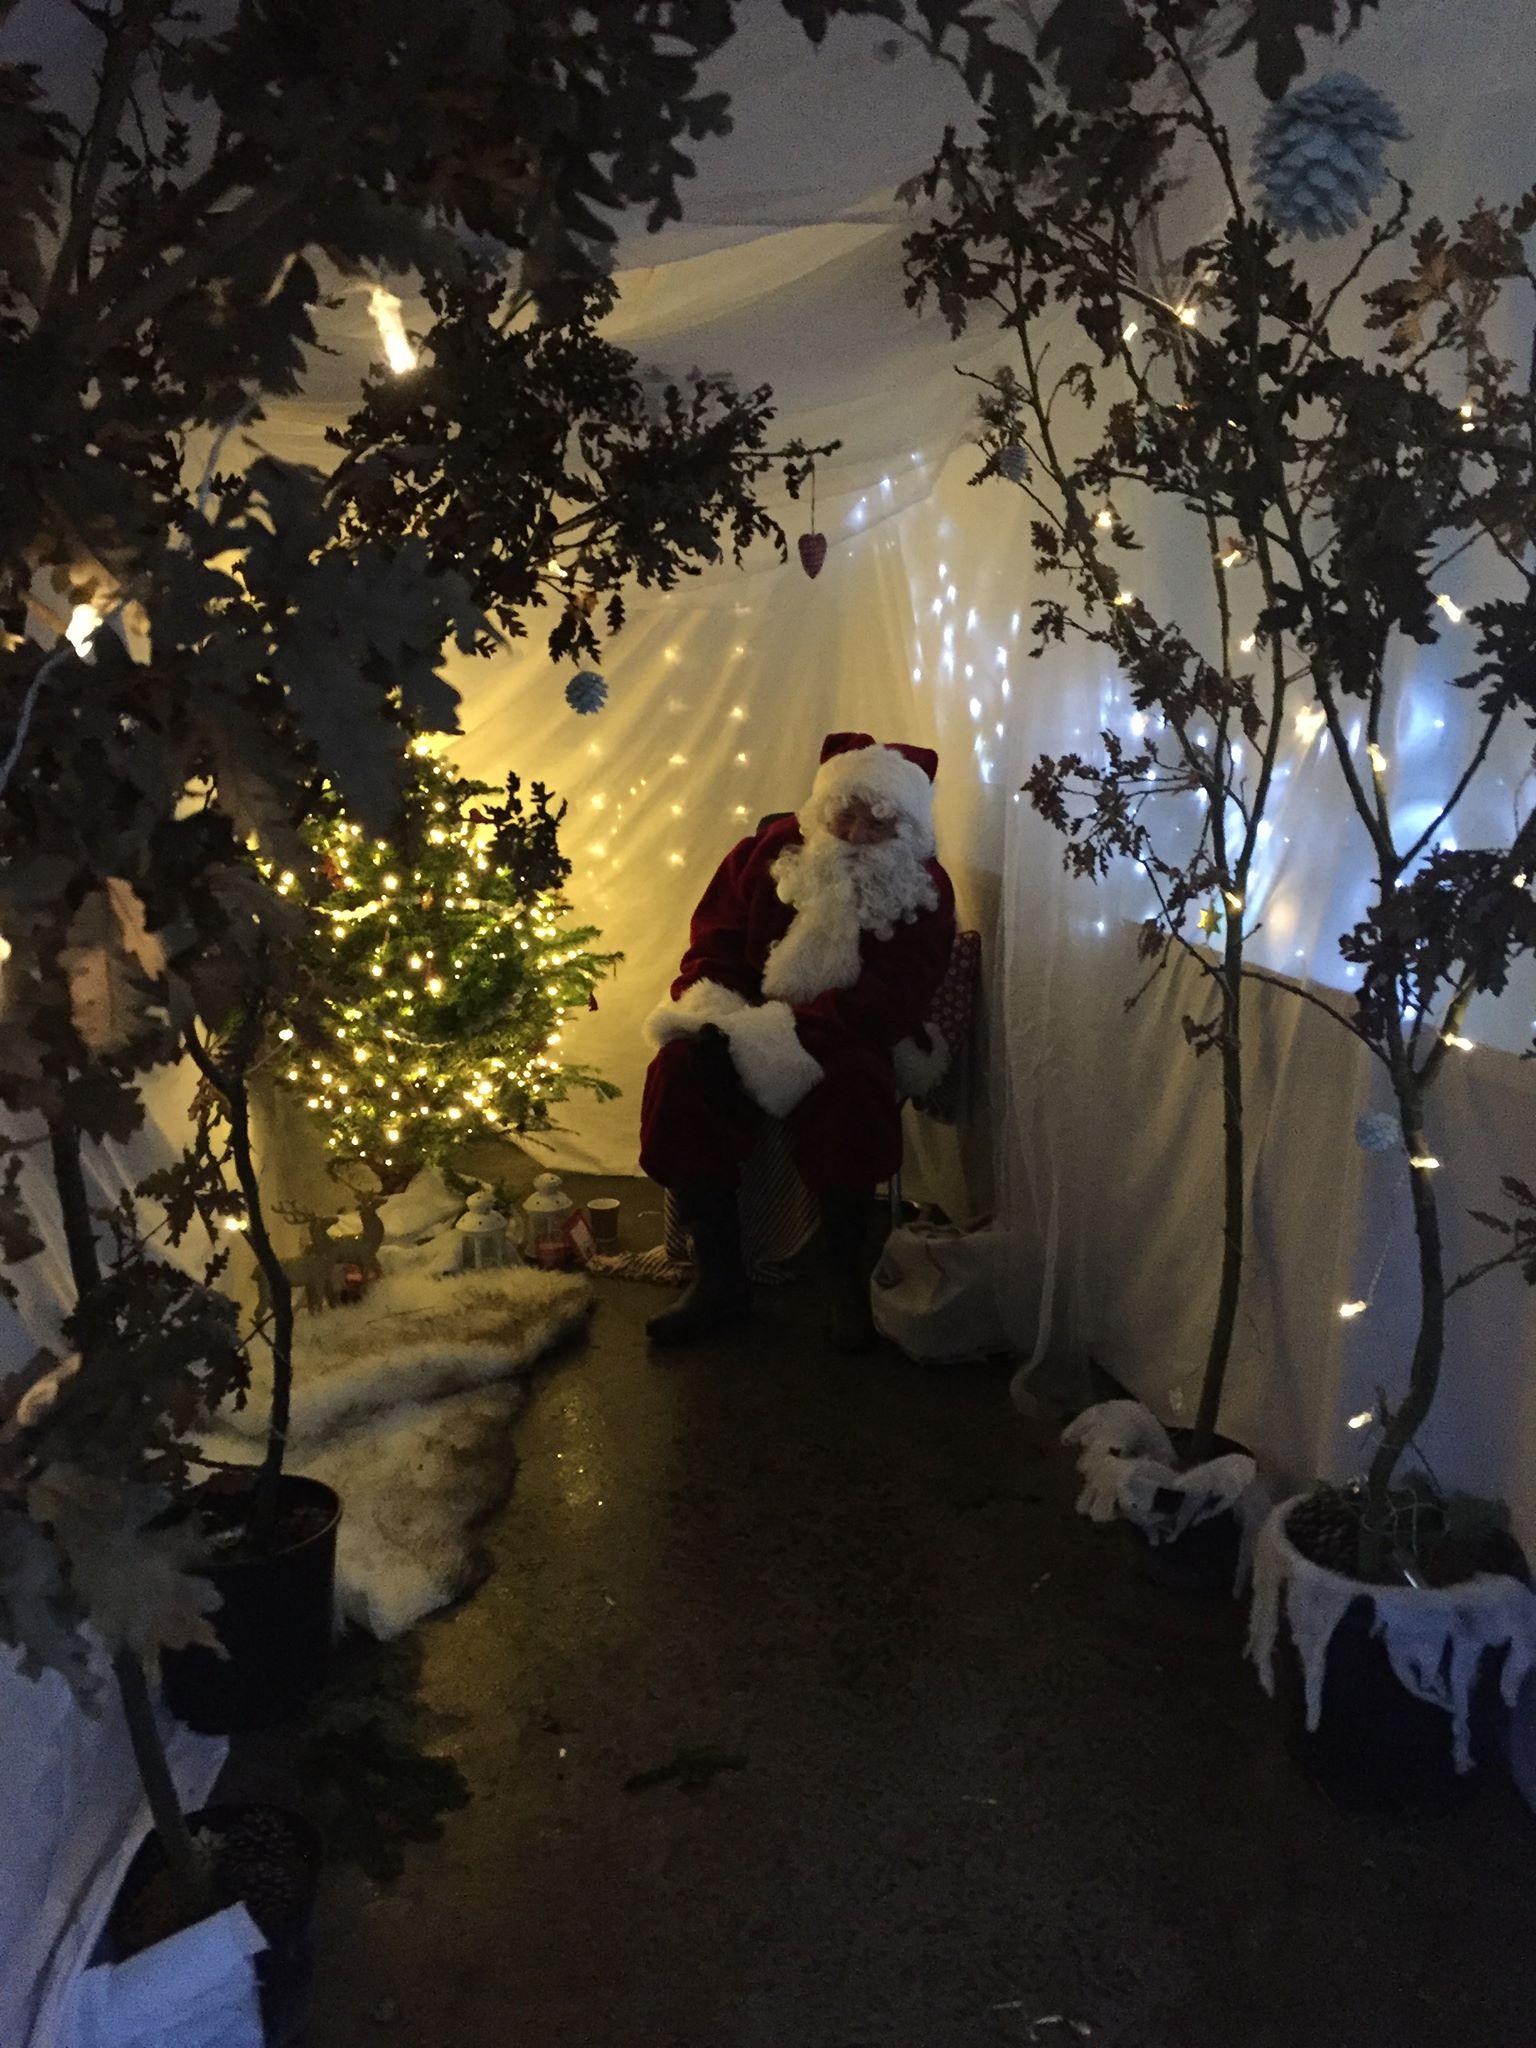 Streatham Christmas Market